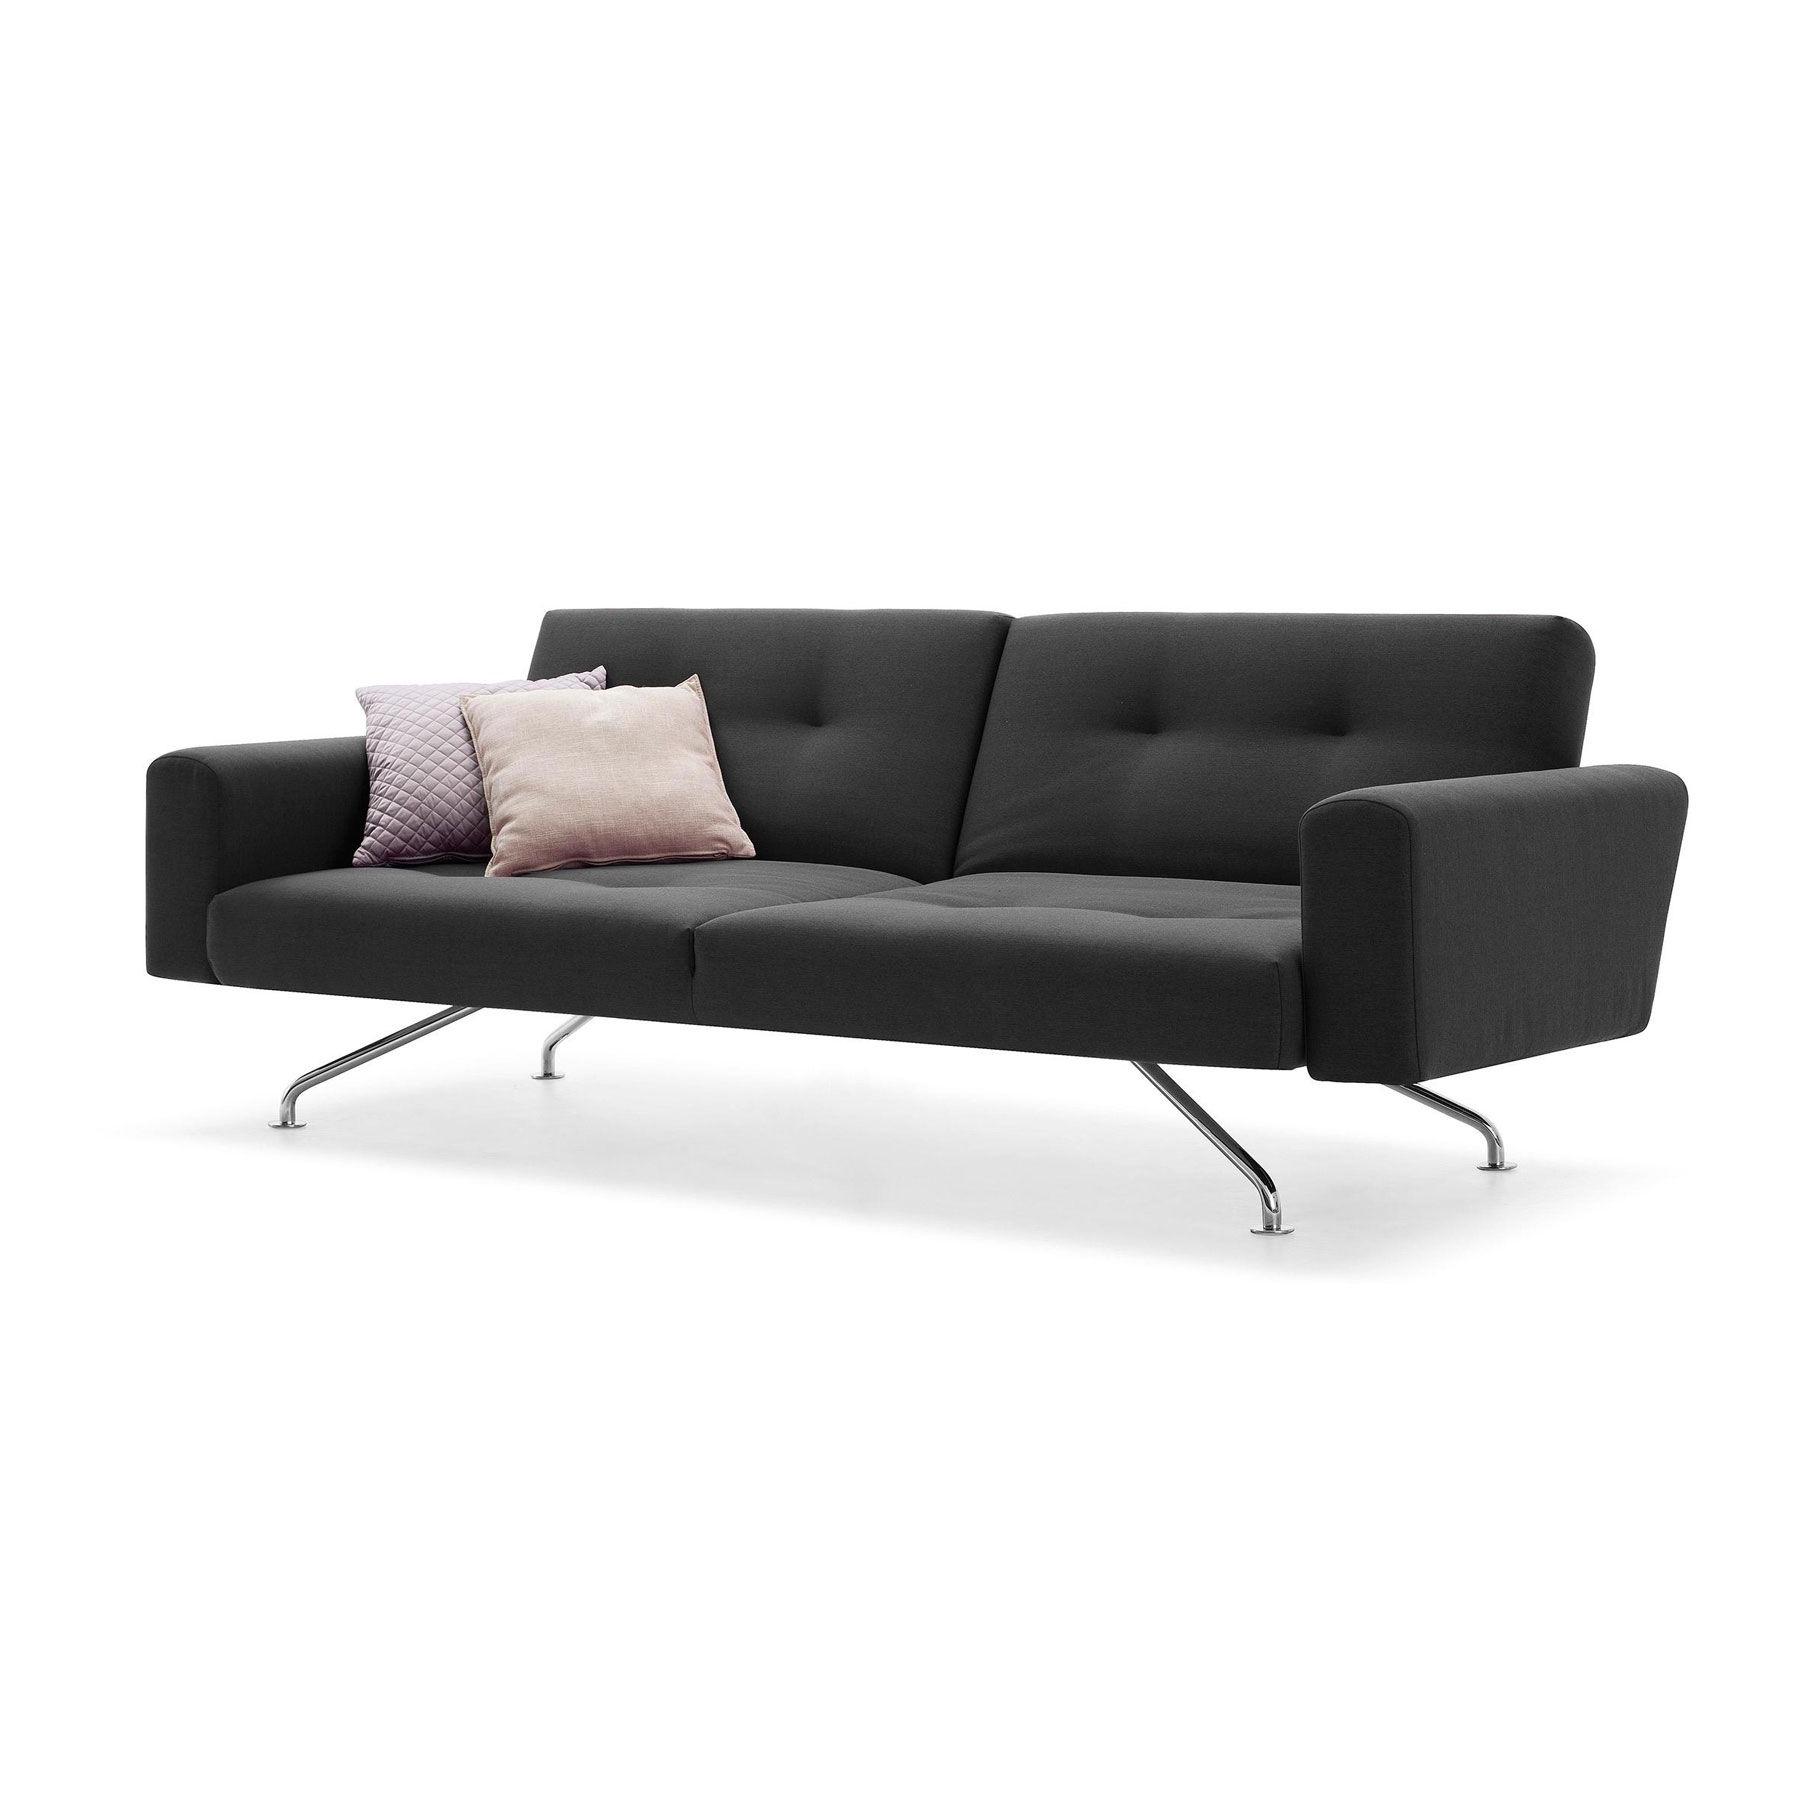 Aidan Convertible Sofa (Gallery 7 of 20)